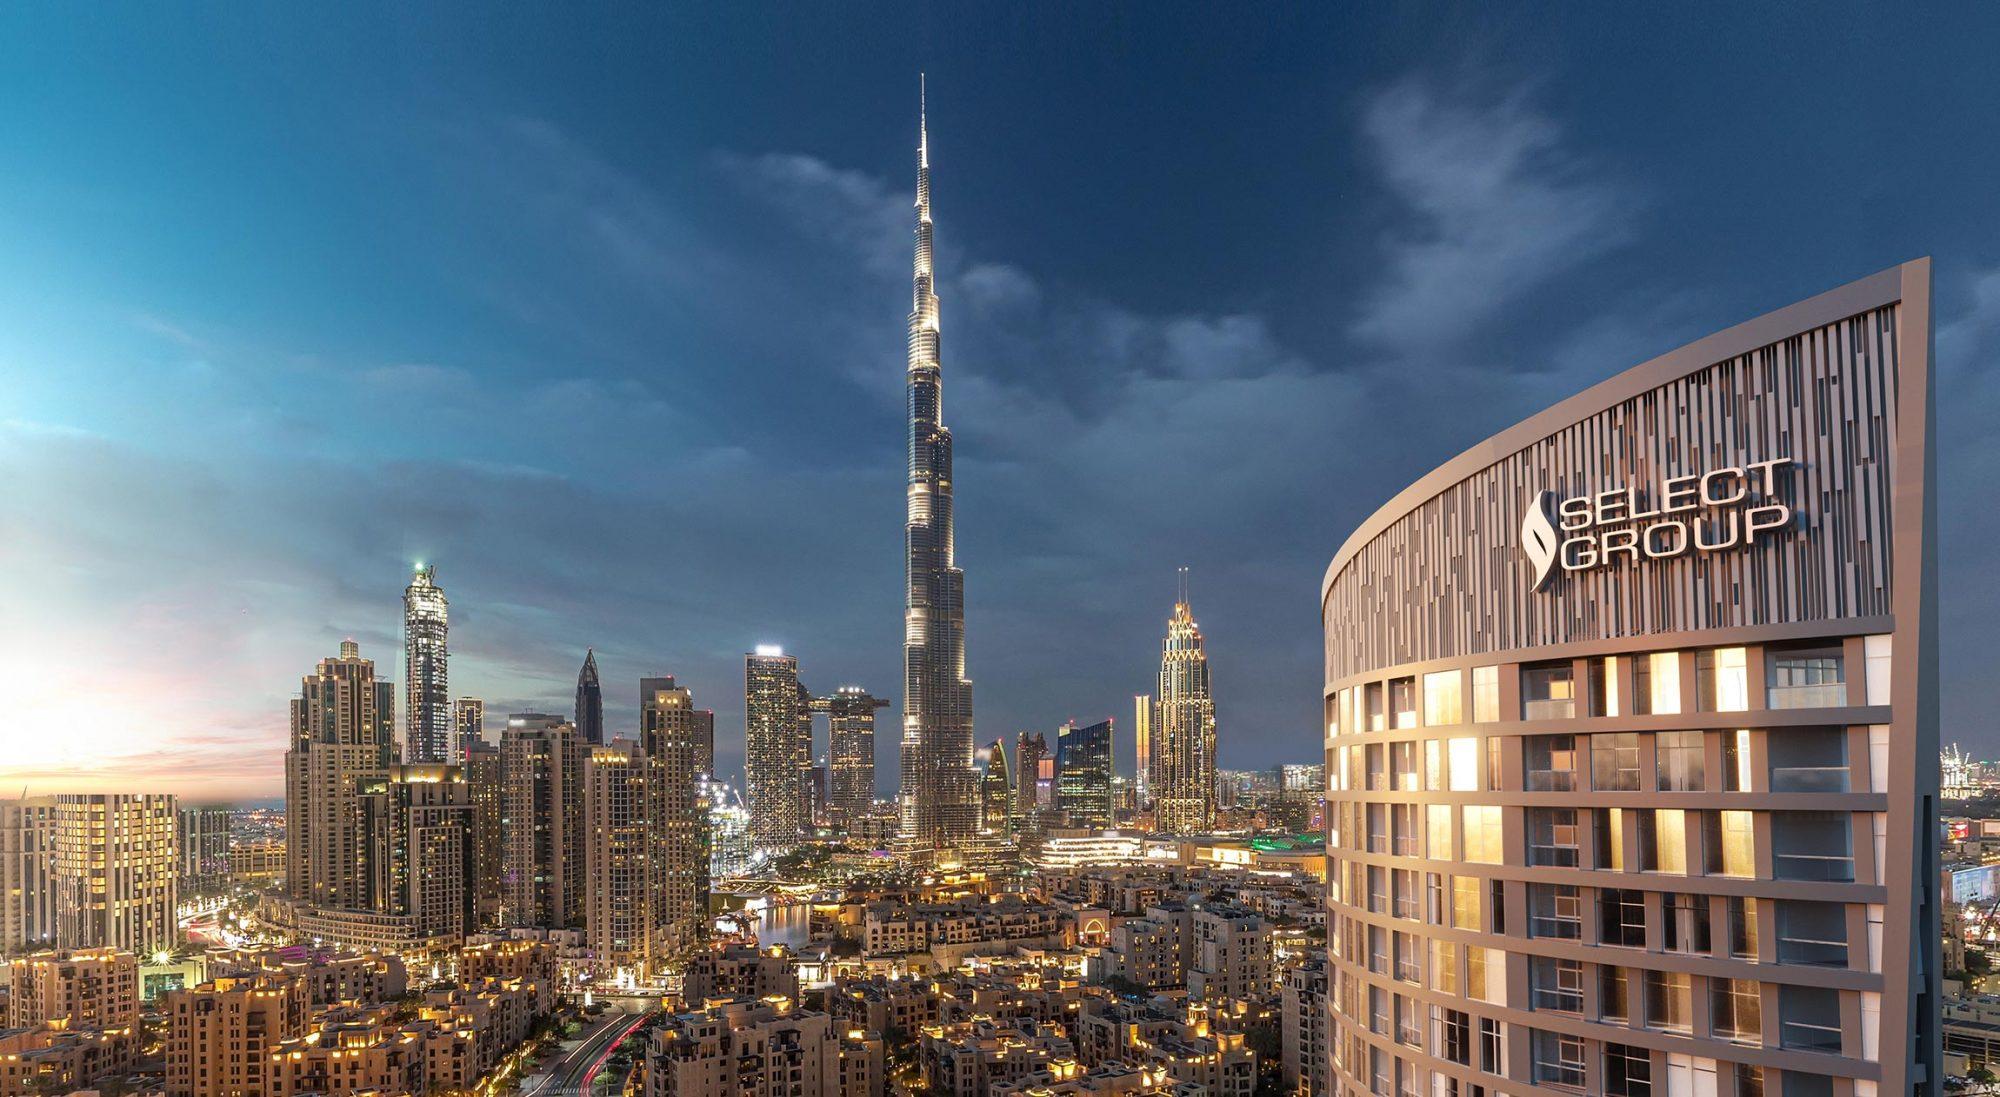 Panoramic Views of The Burj Khalifa